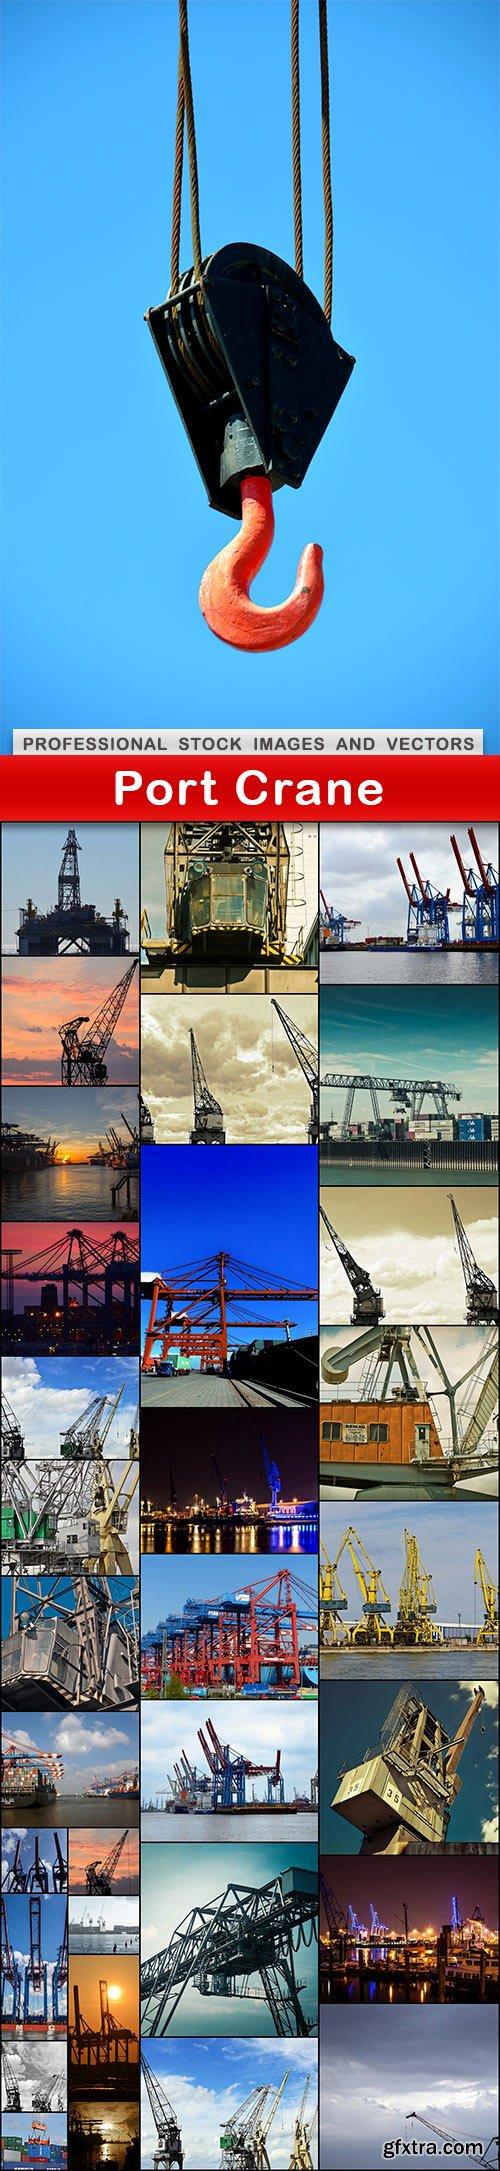 Port Crane - 33 UHQ JPEG